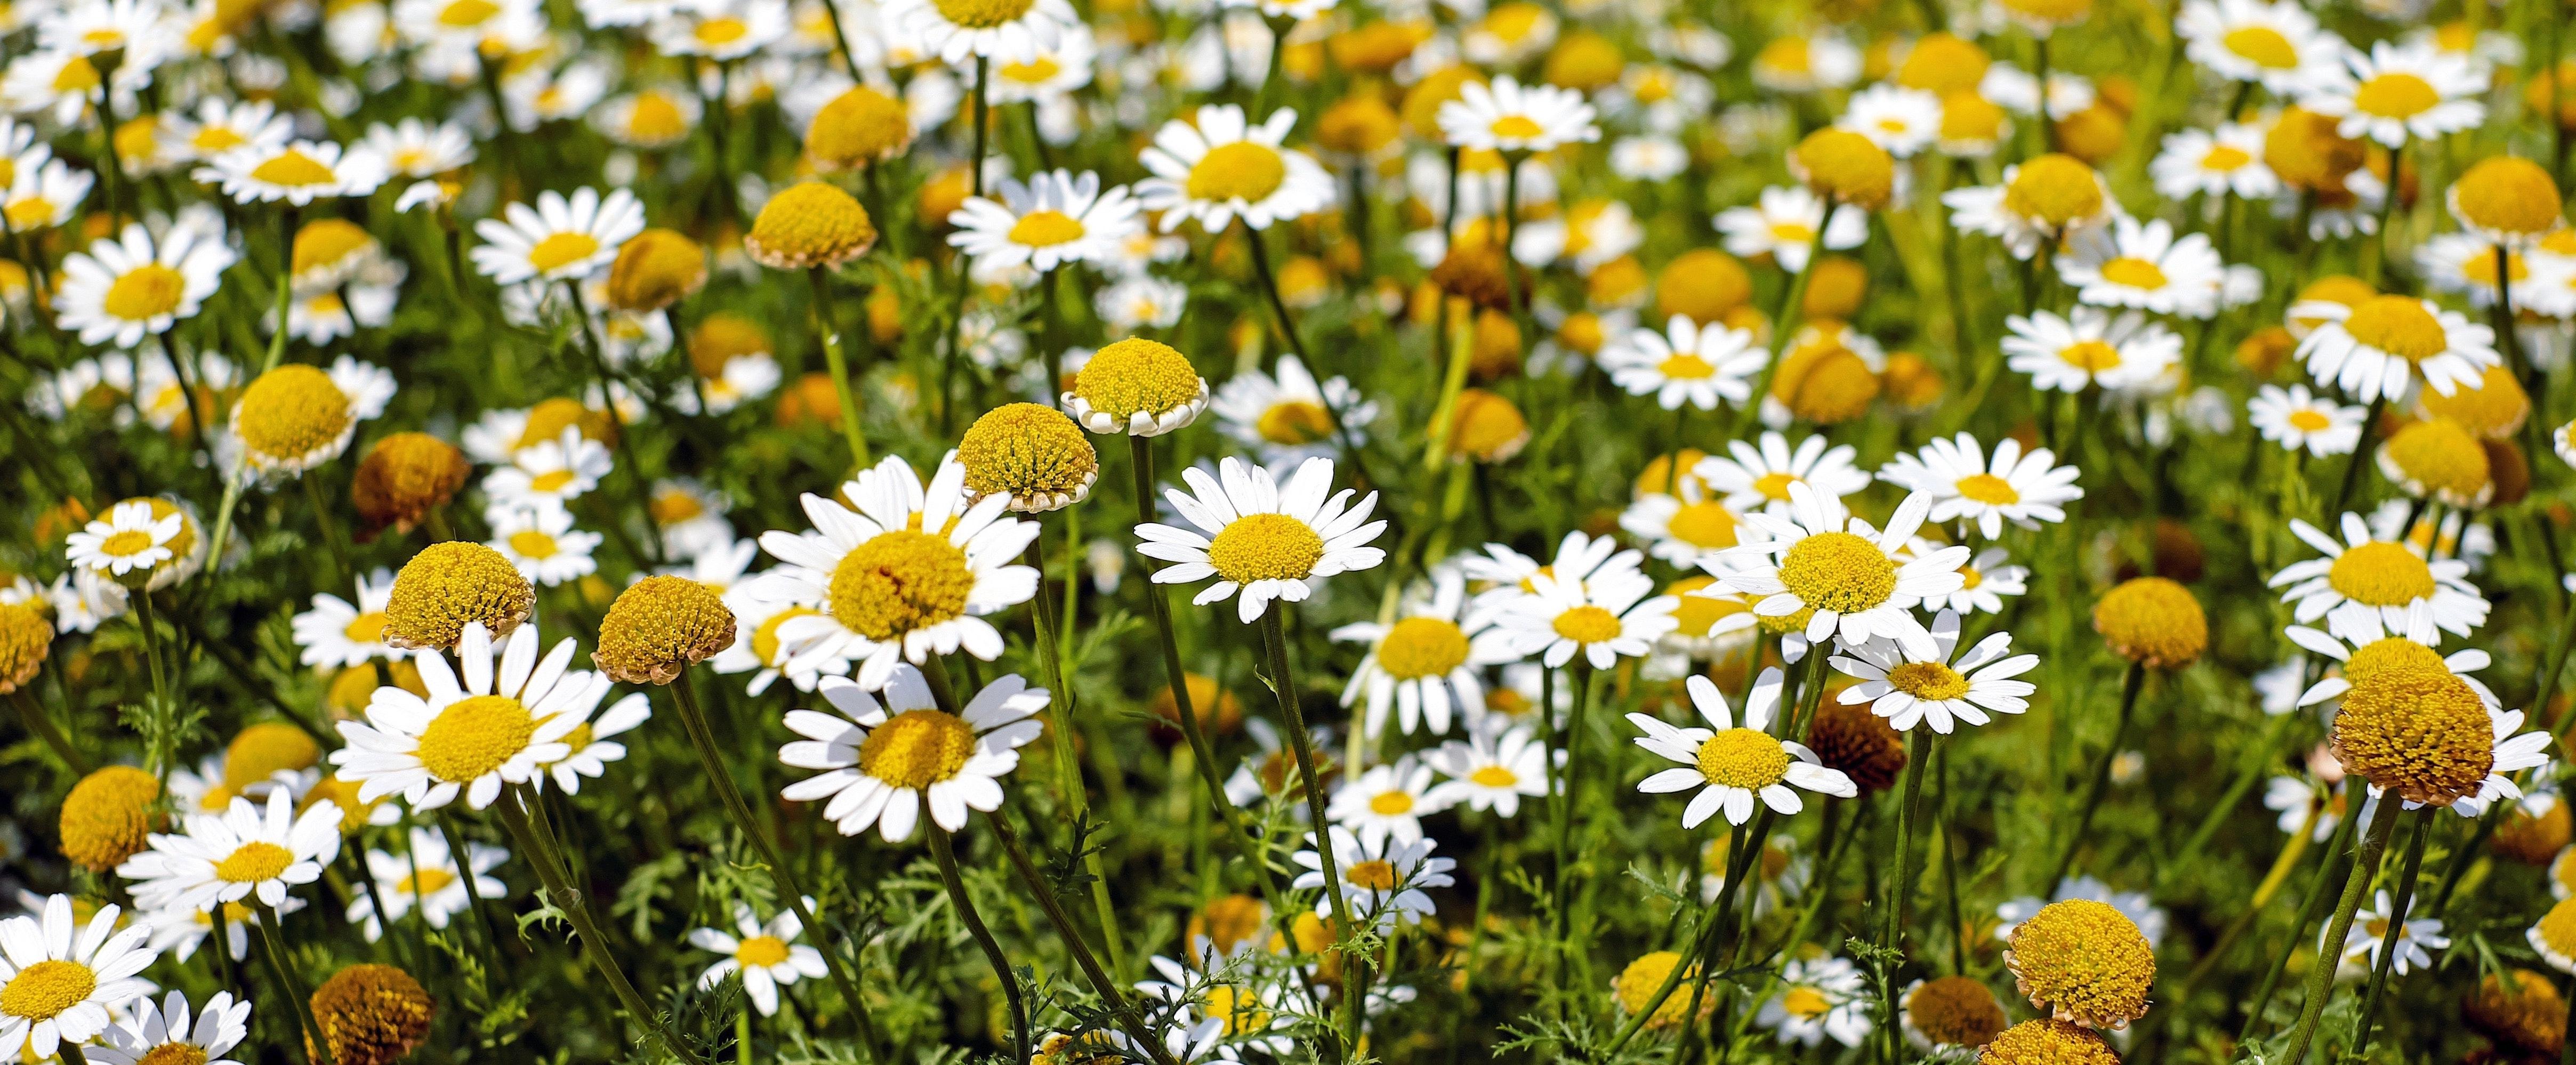 chamomile flowers growing in field